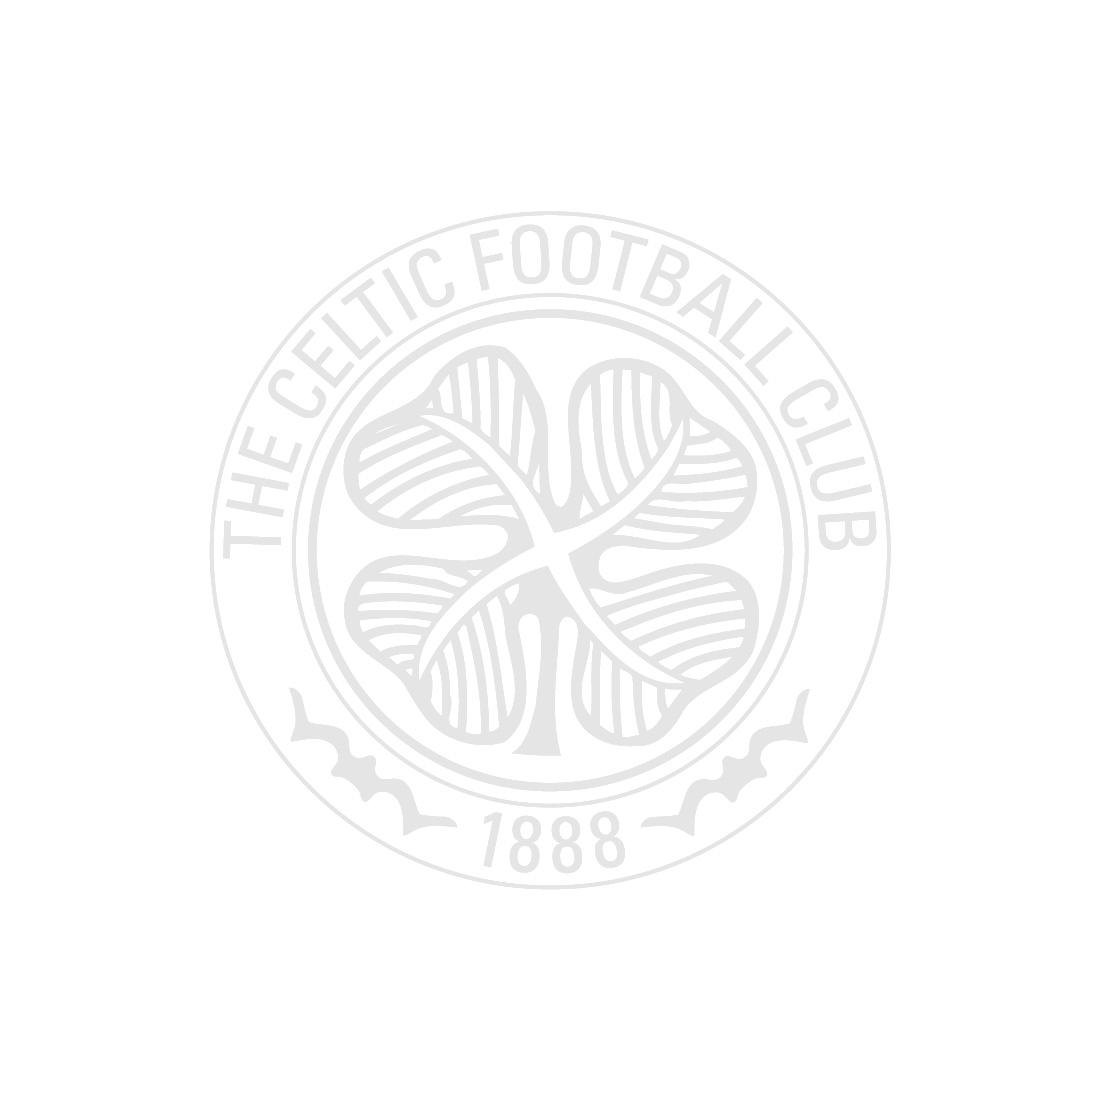 Celtic Bhoys Graffiti Iphone Cover